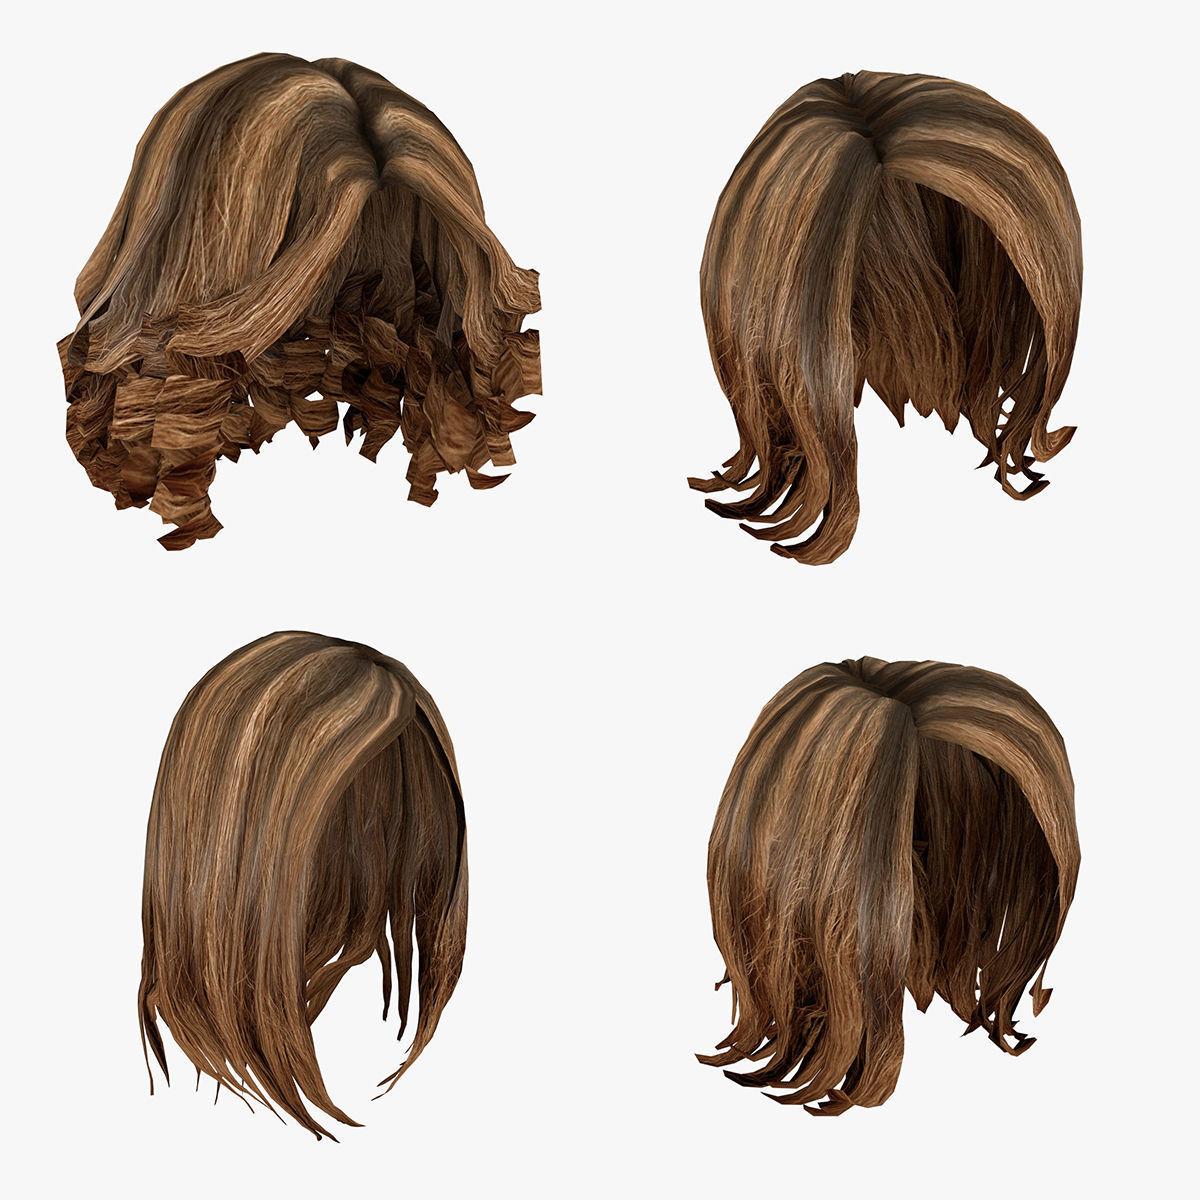 Female hairstyle hair pack  5D model